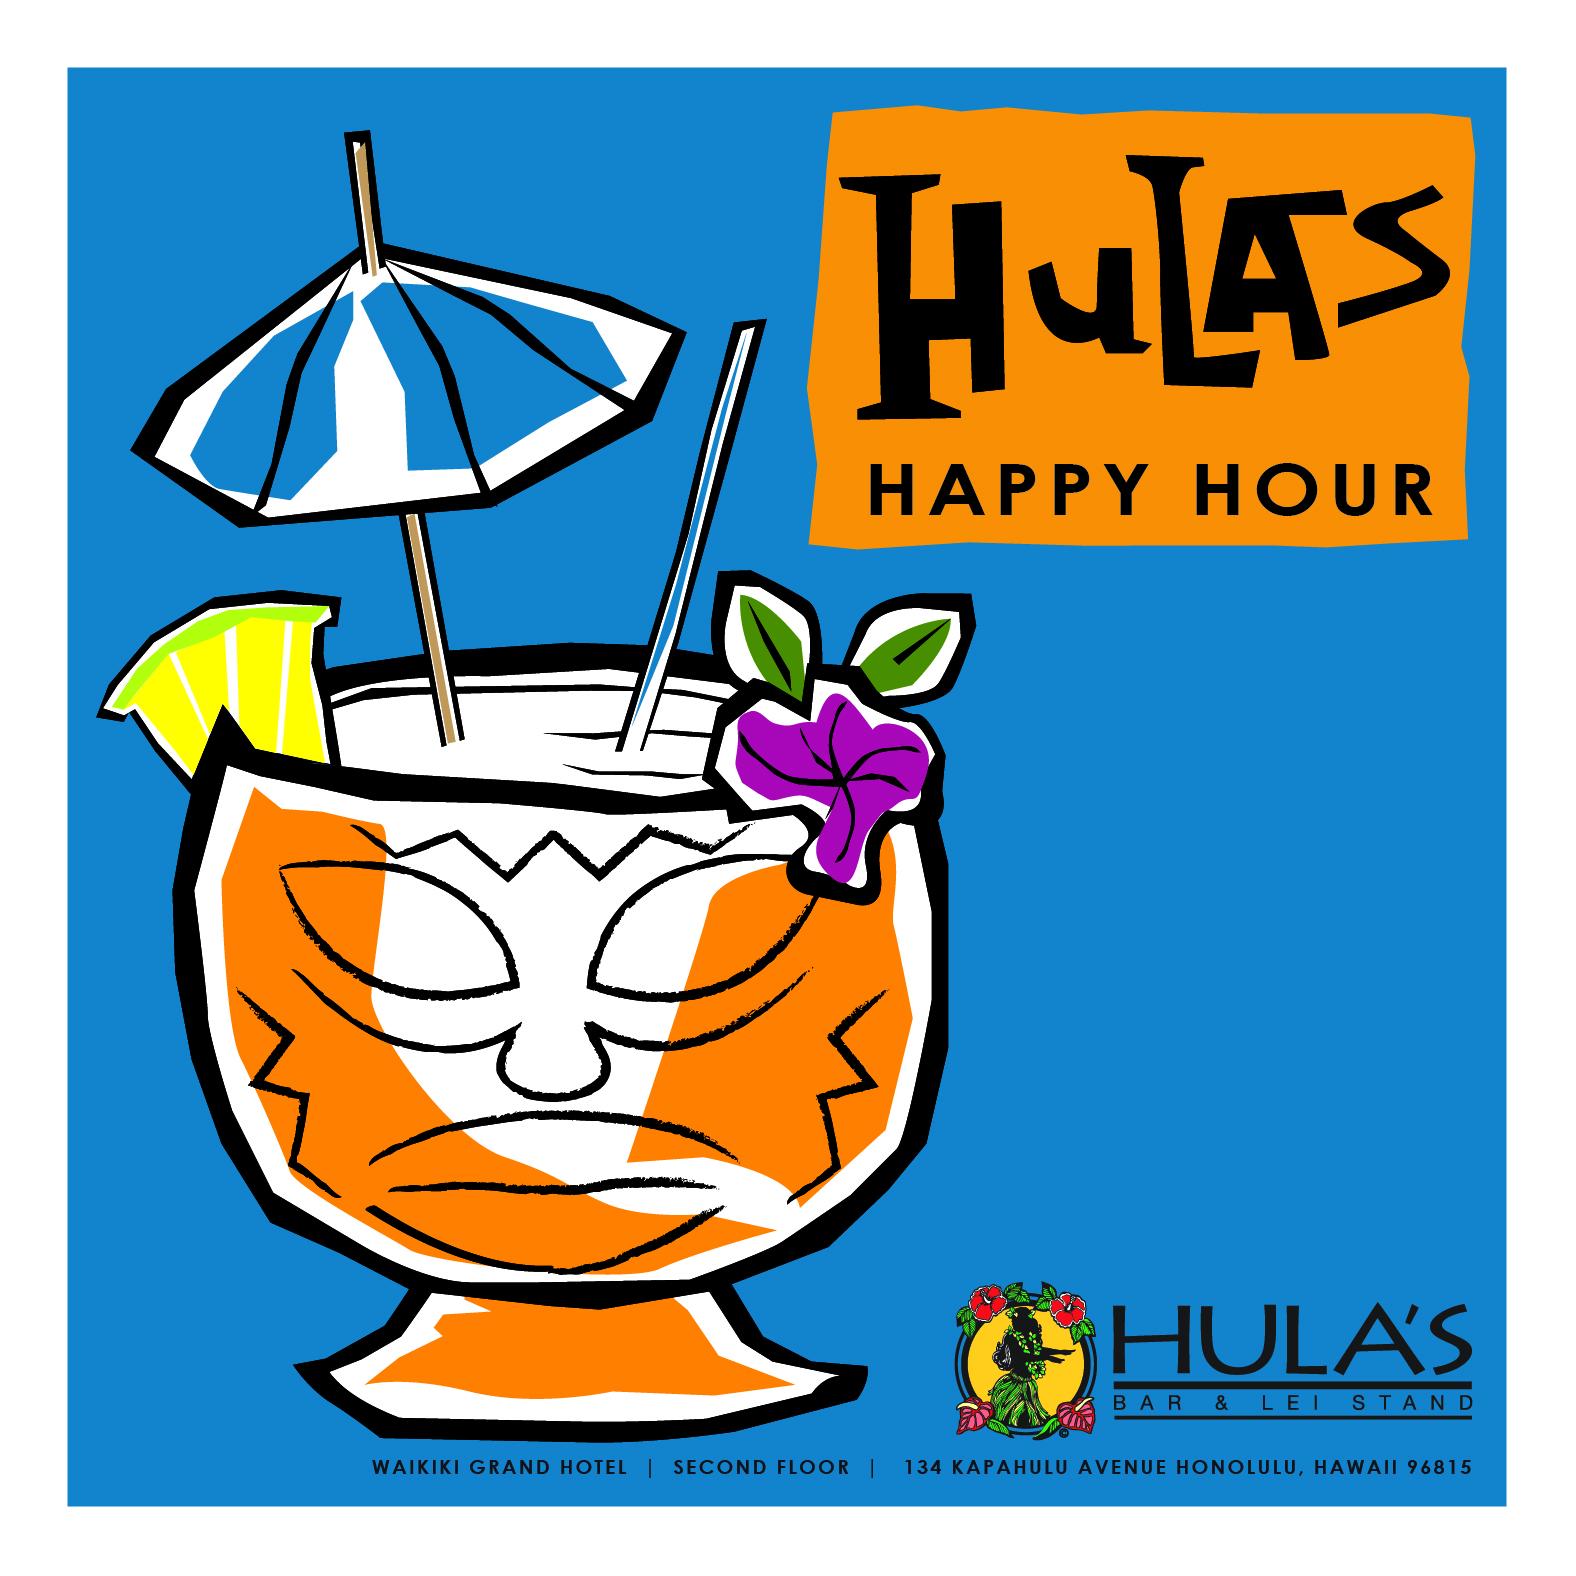 hulas happy hour flyer FRONT-01.jpg